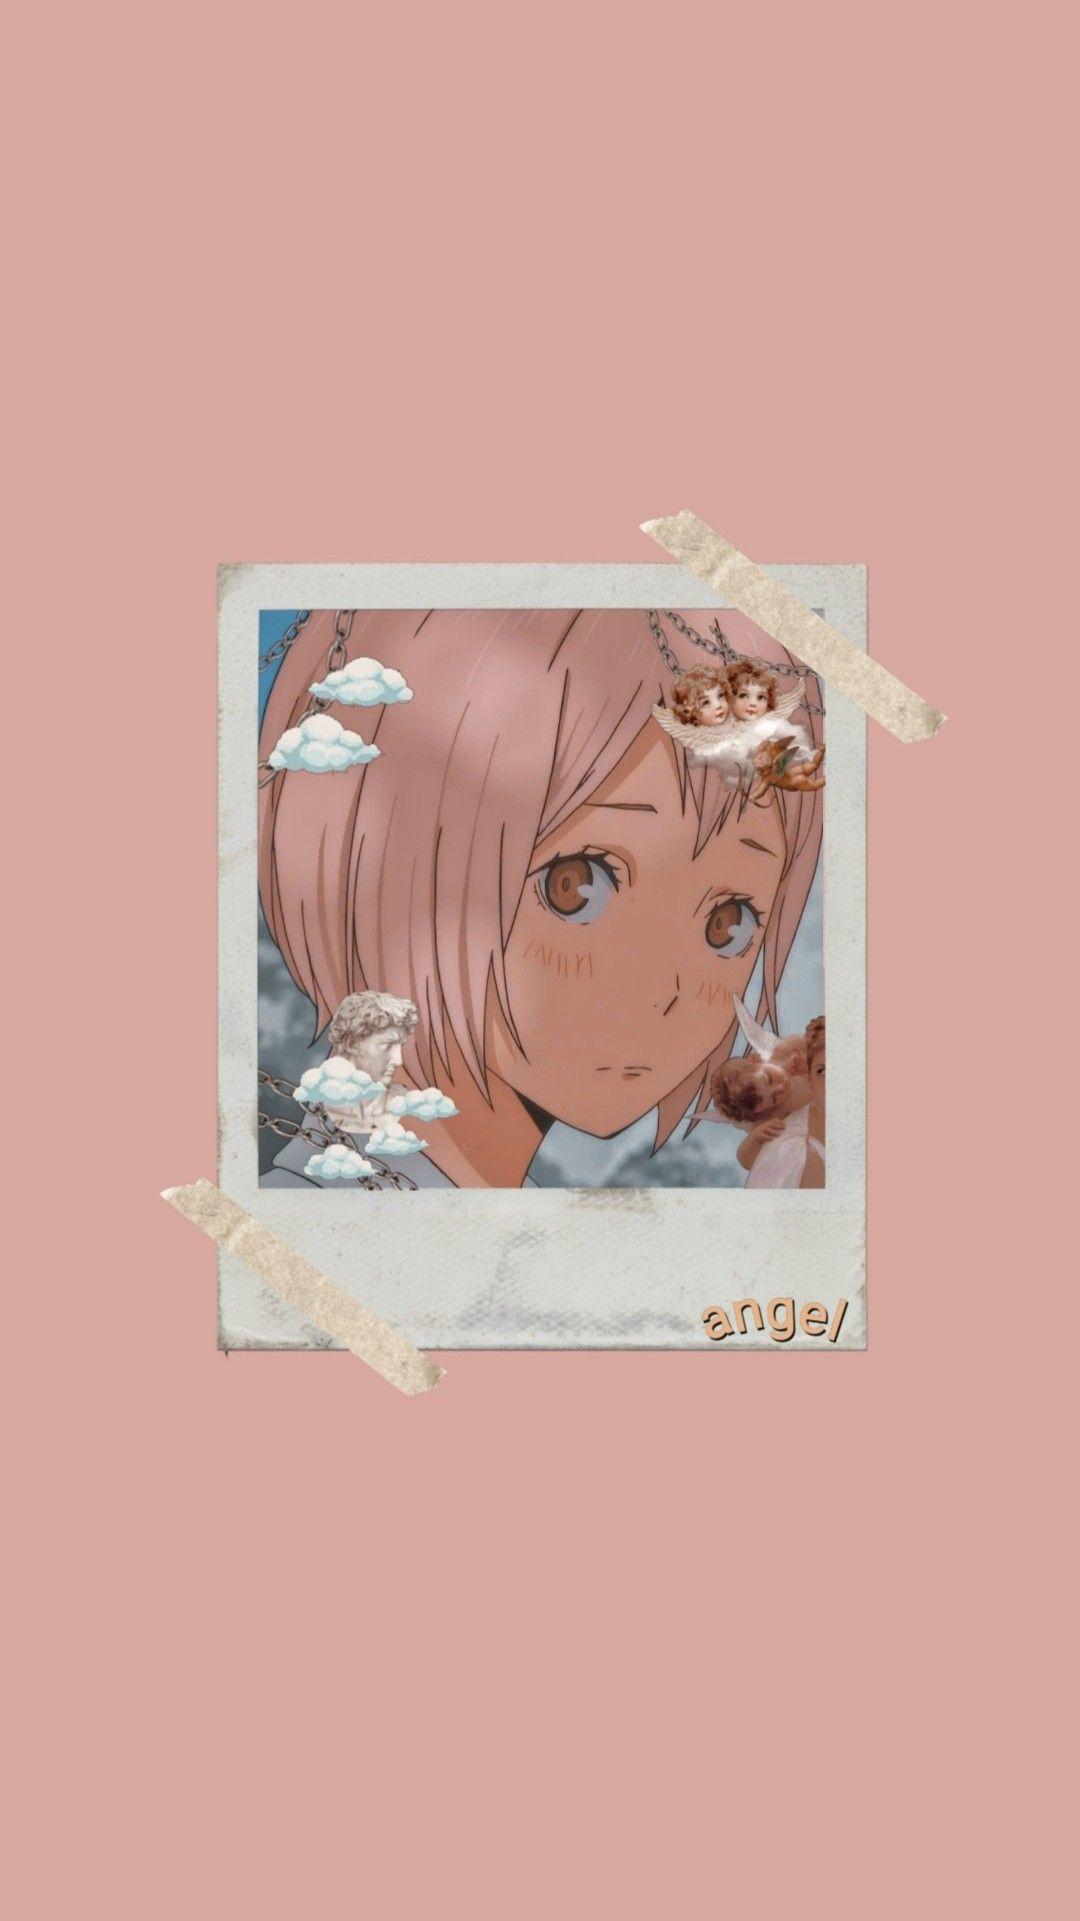 𝕪𝕒𝕔𝕙𝕚 𝕙𝕚𝕥𝕠𝕜𝕒 Wallpaper Anime Haikyuu Wallpaper